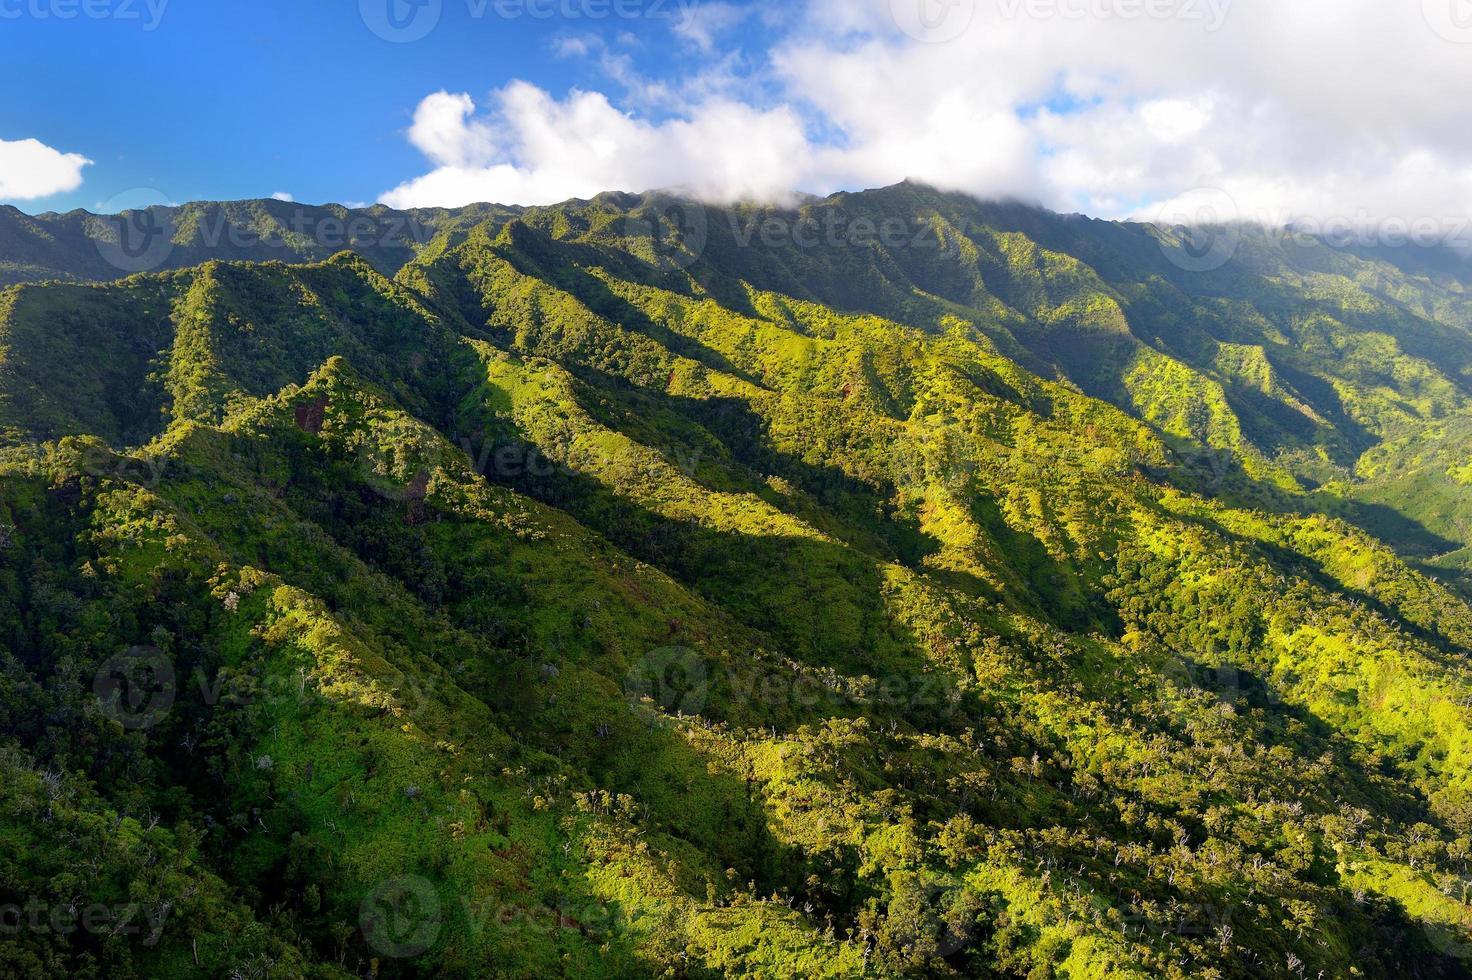 vista aérea deslumbrante de selvas espetaculares, kauai foto